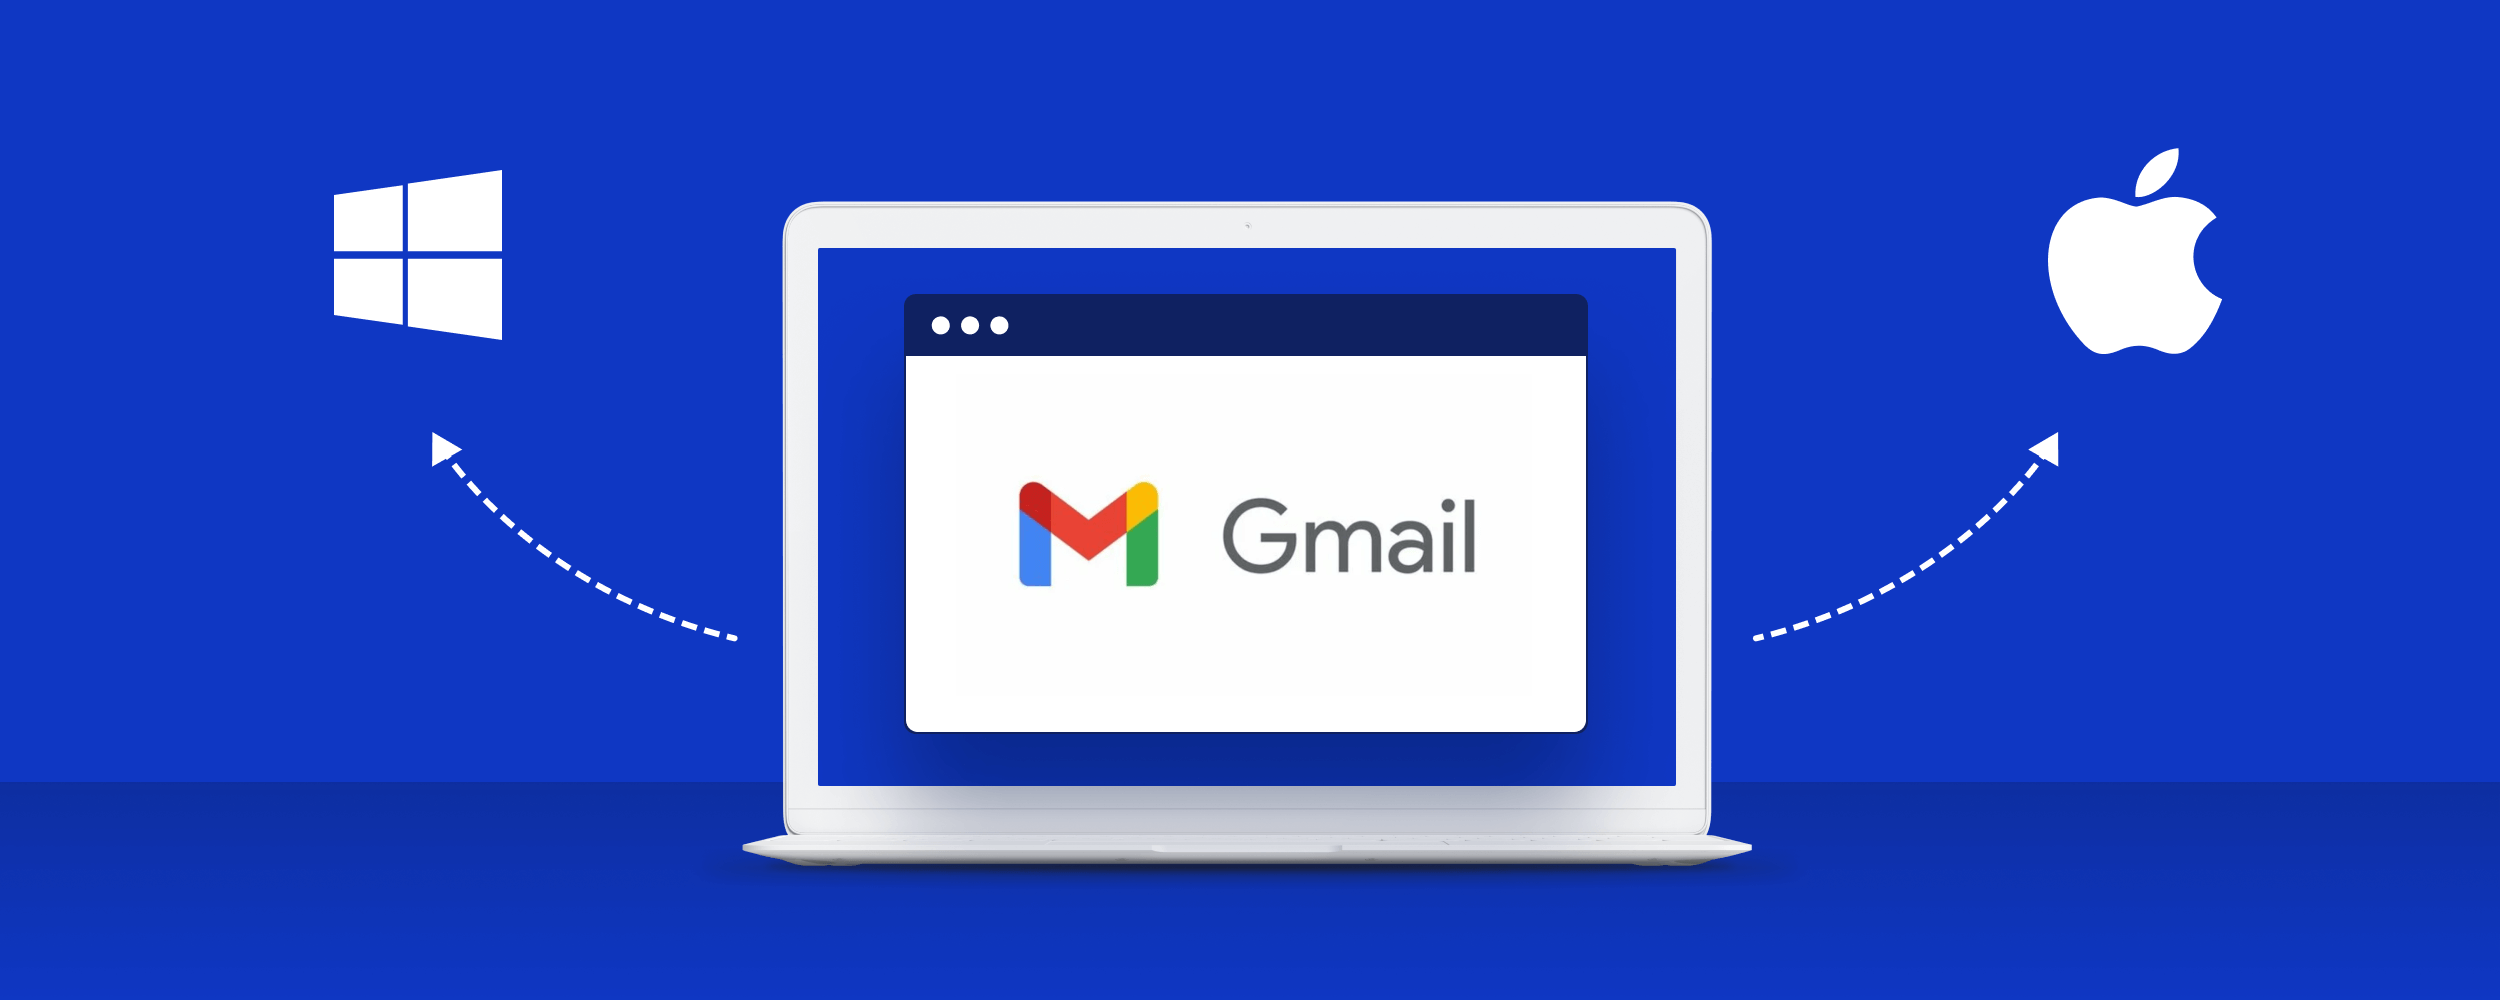 Gmail desktop app feature image